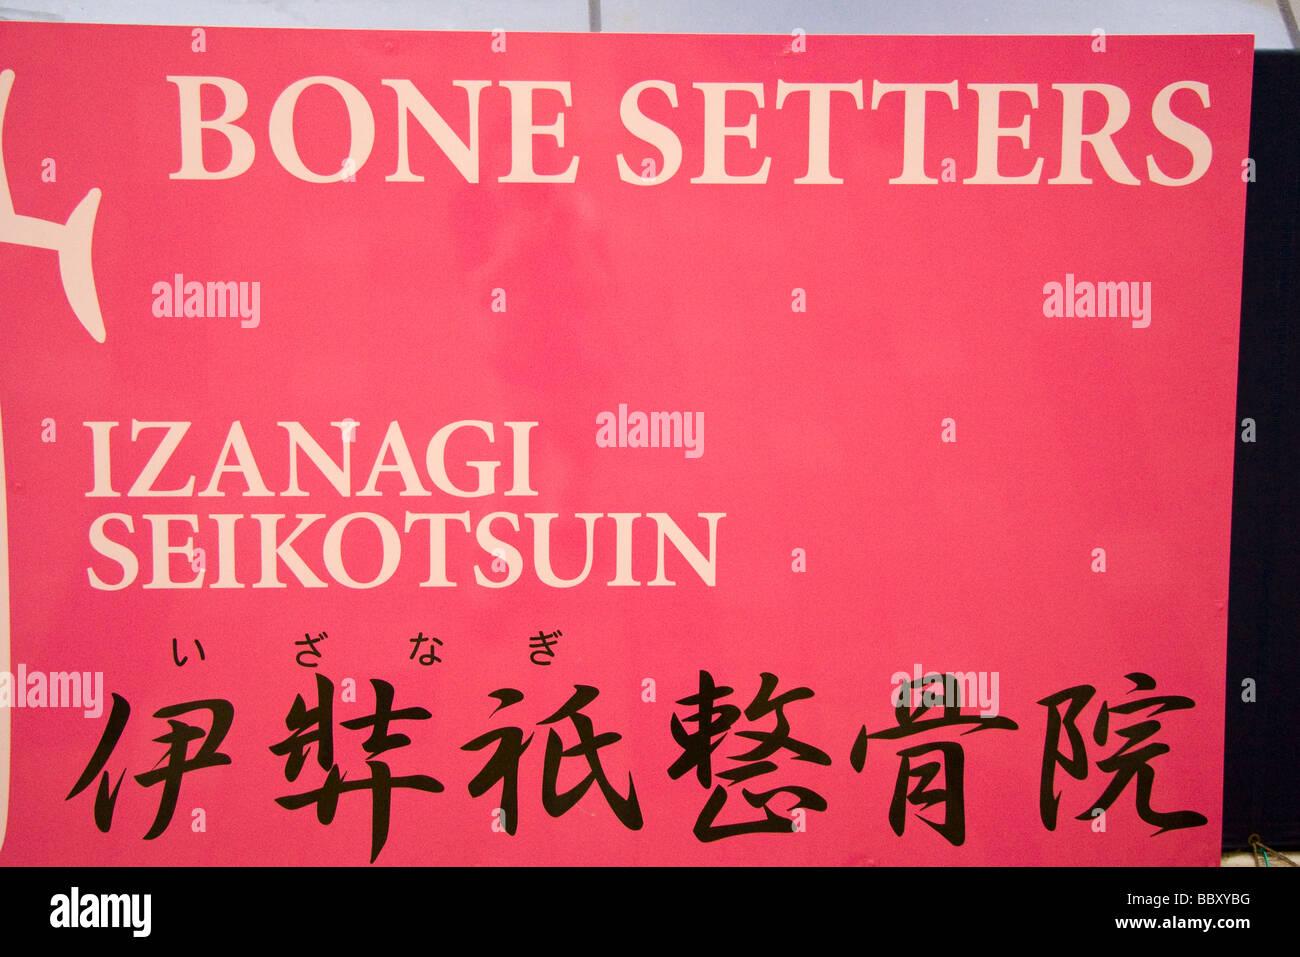 Japan. Sign for 'bone setters' - Stock Image